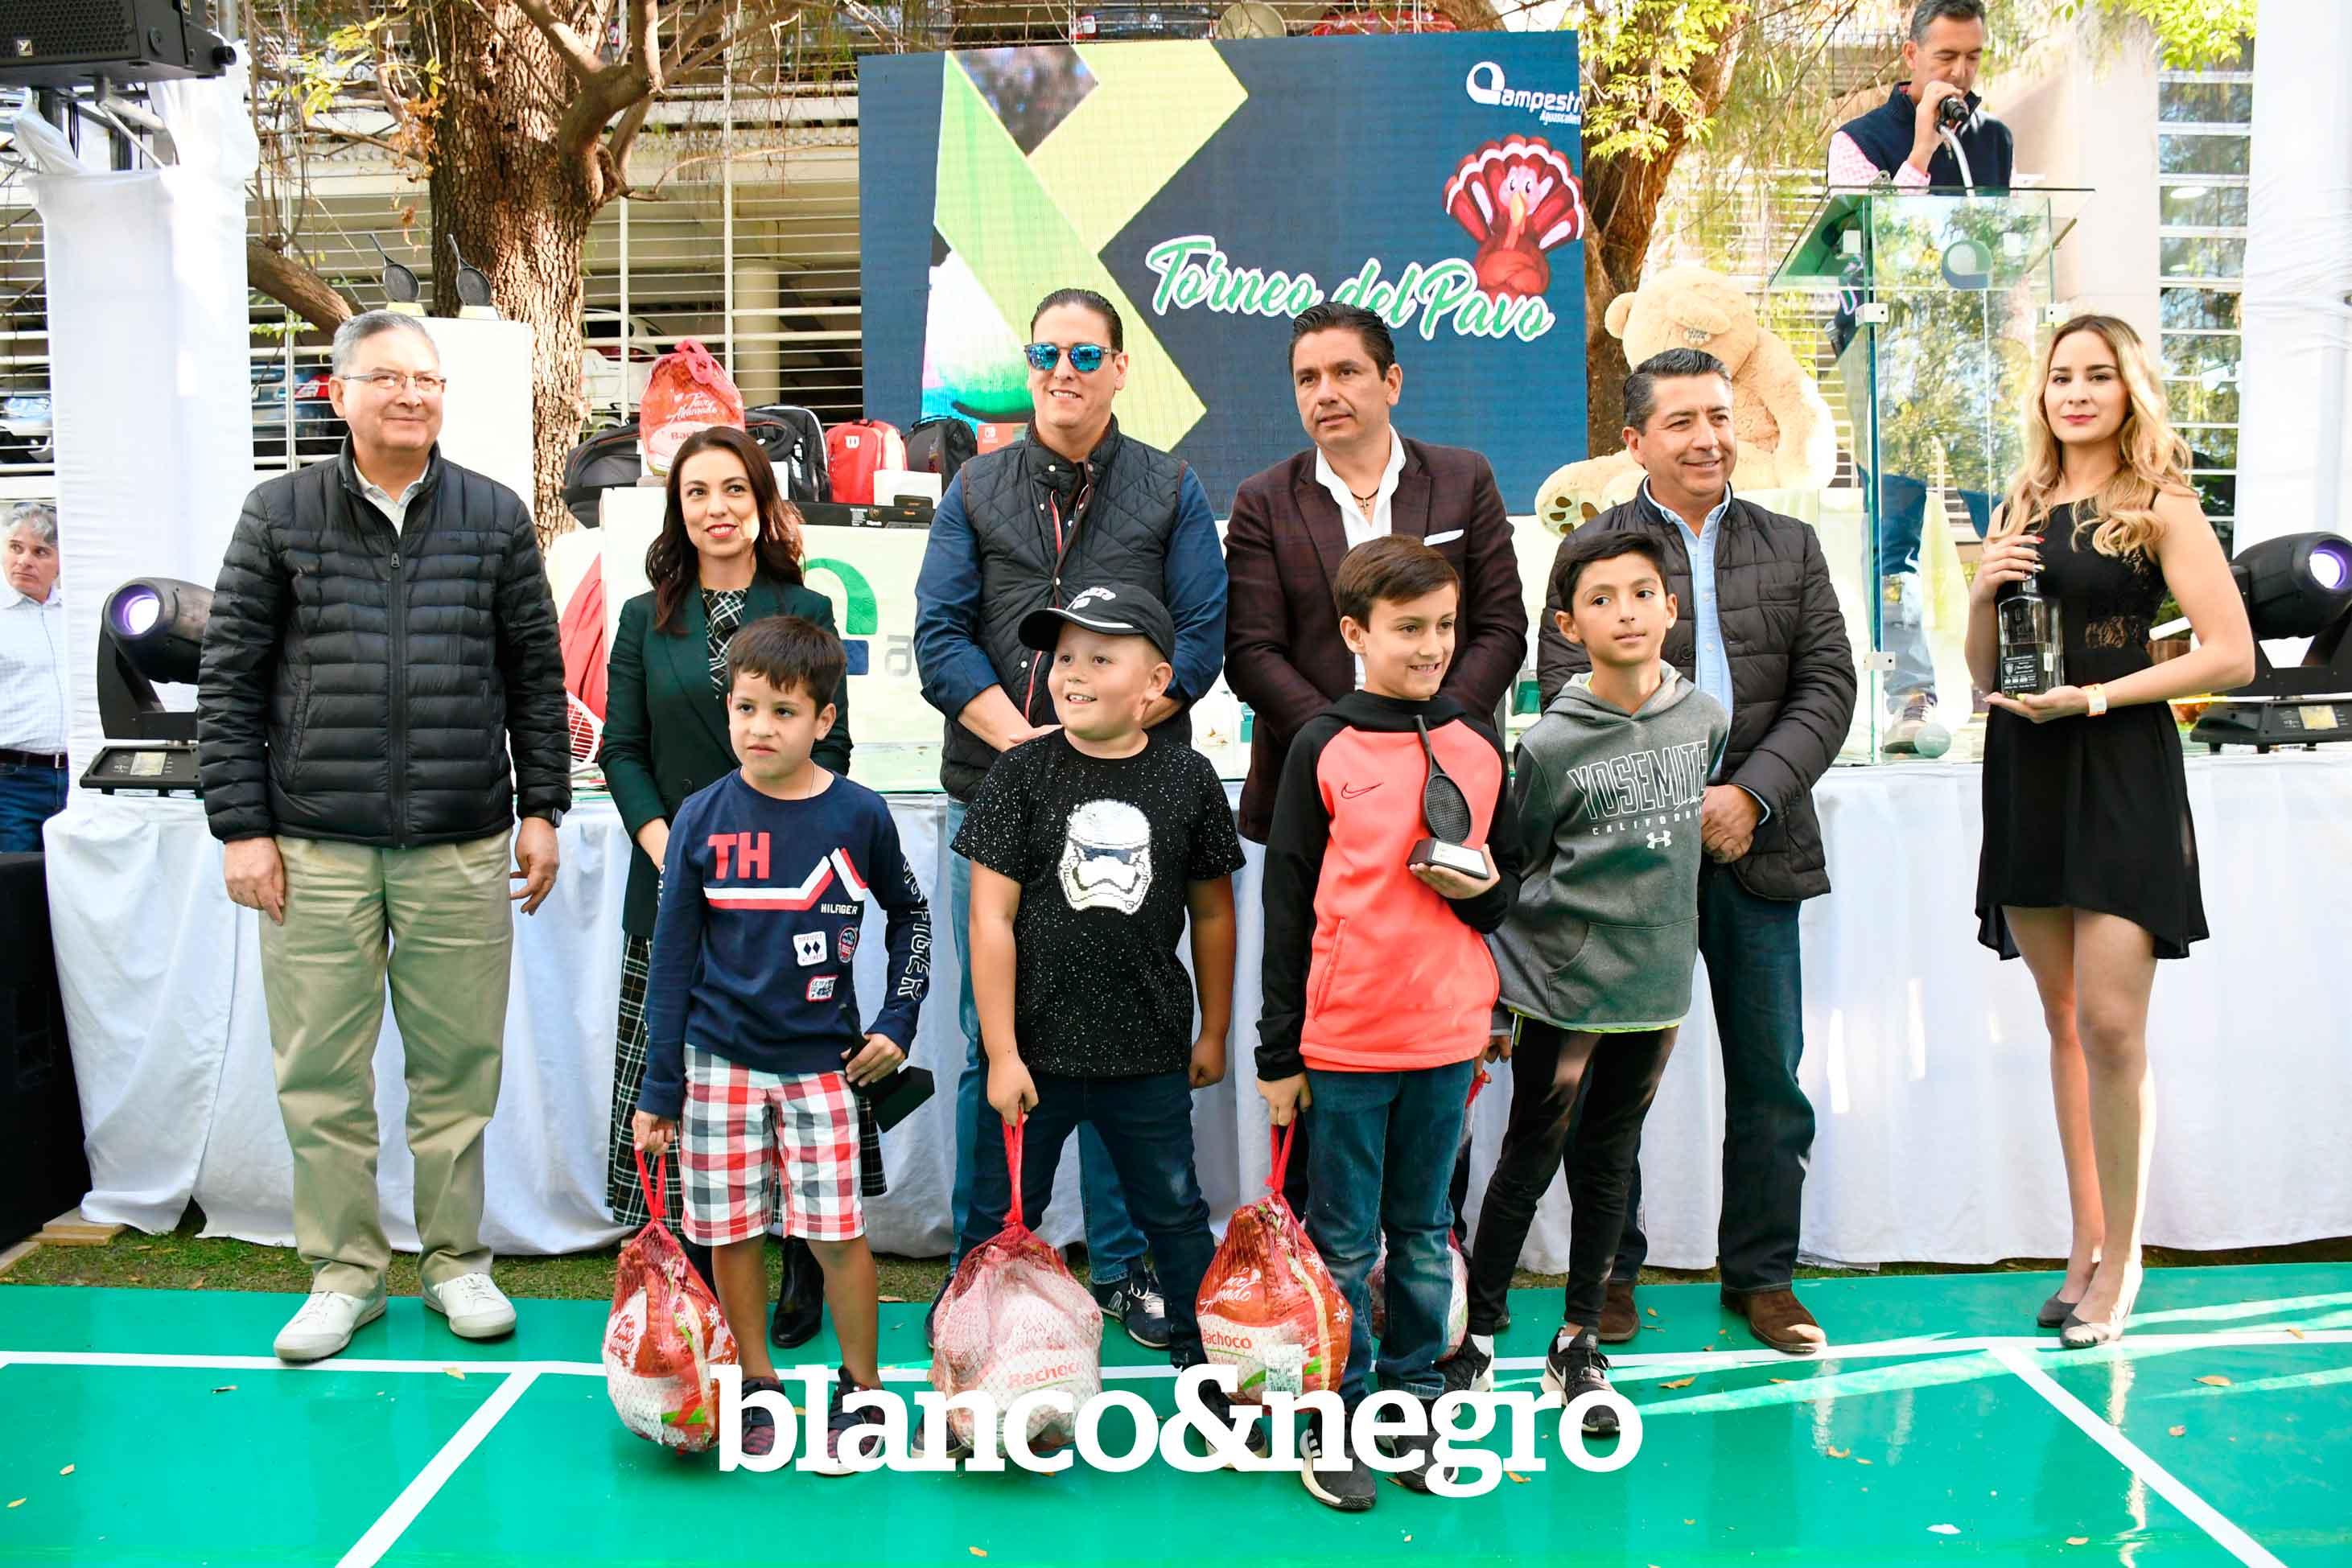 Torneo-del-Pavo-233